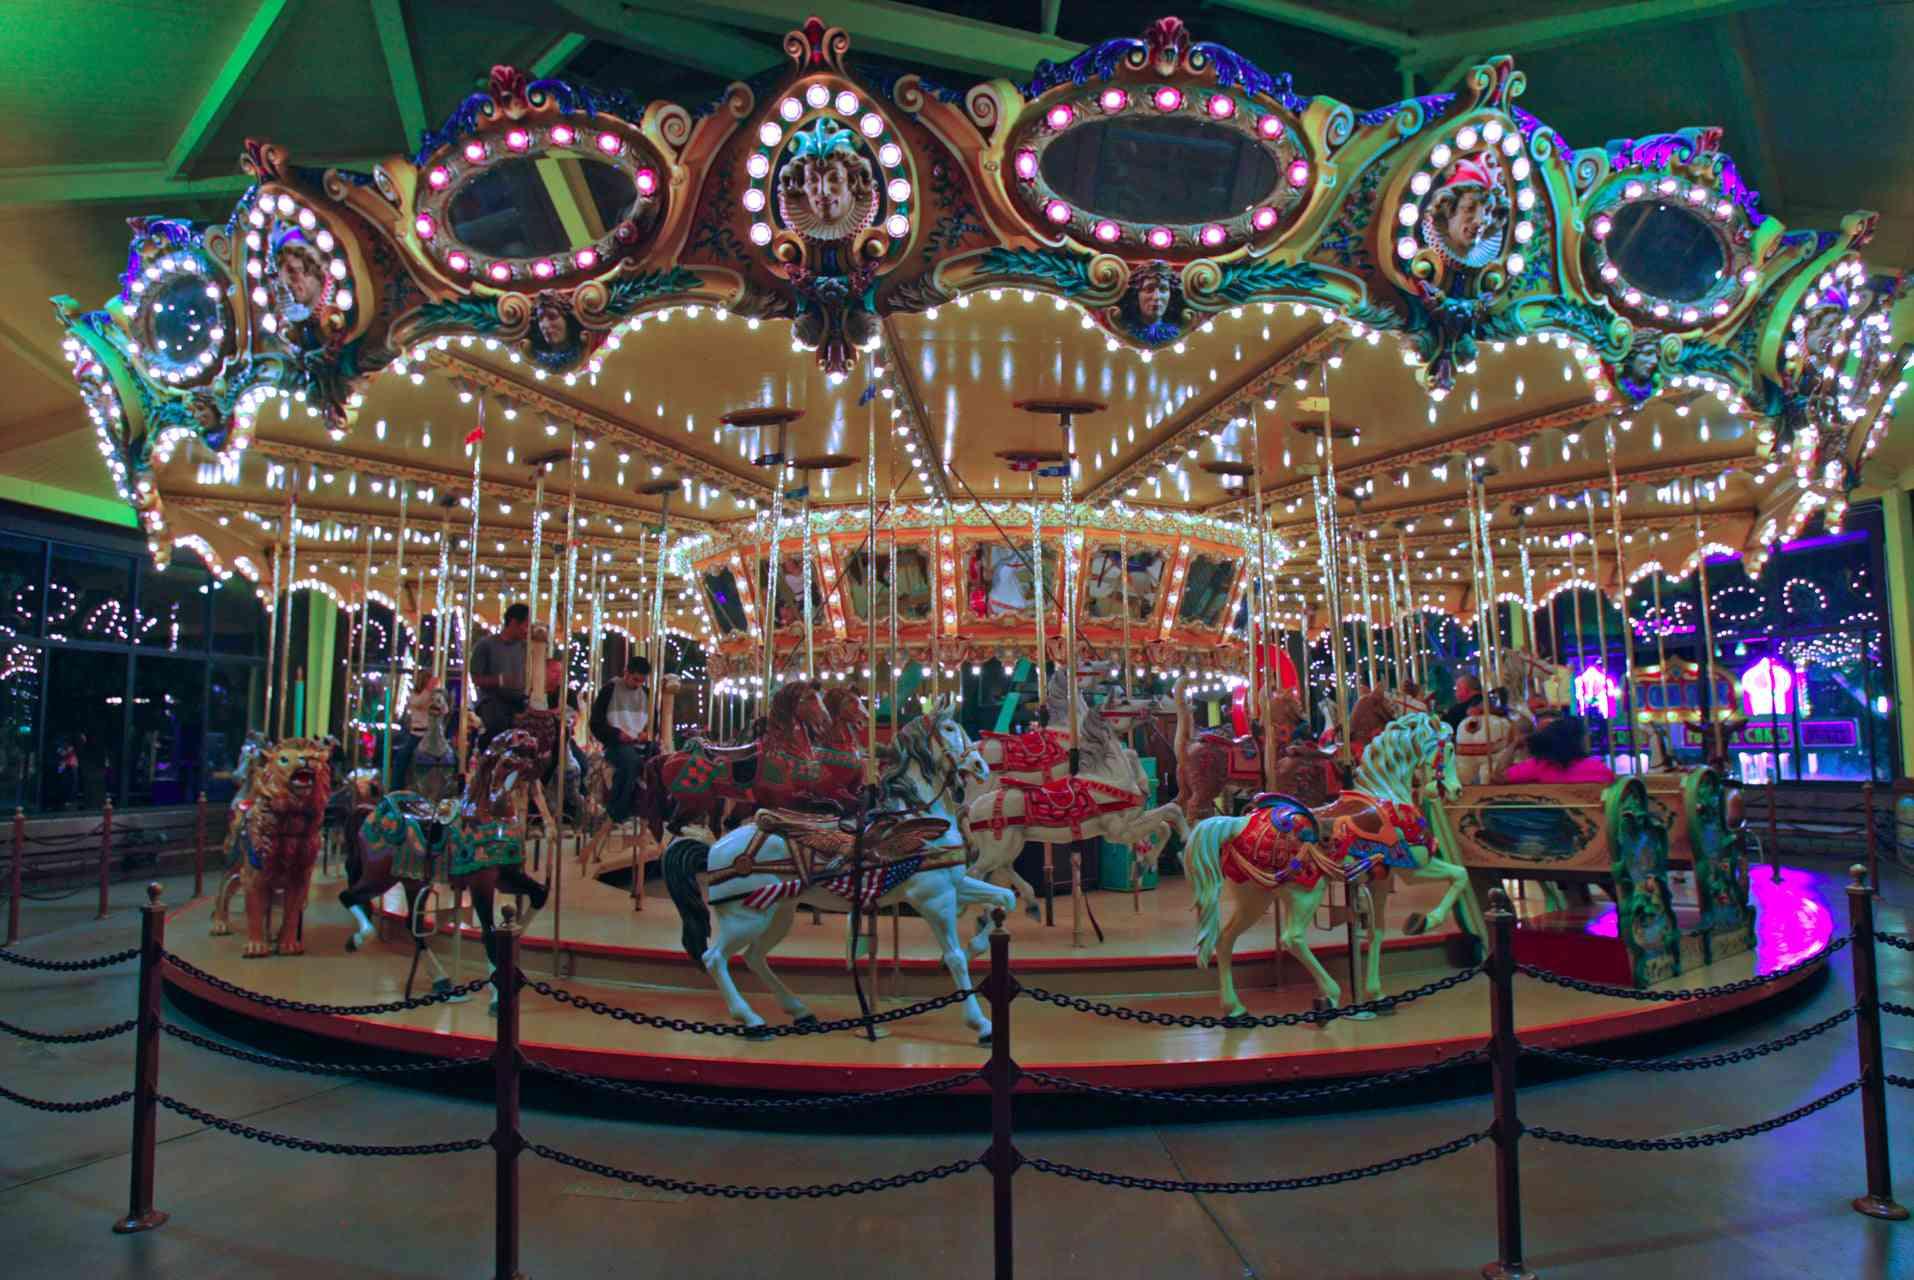 Castle Park carousel in California